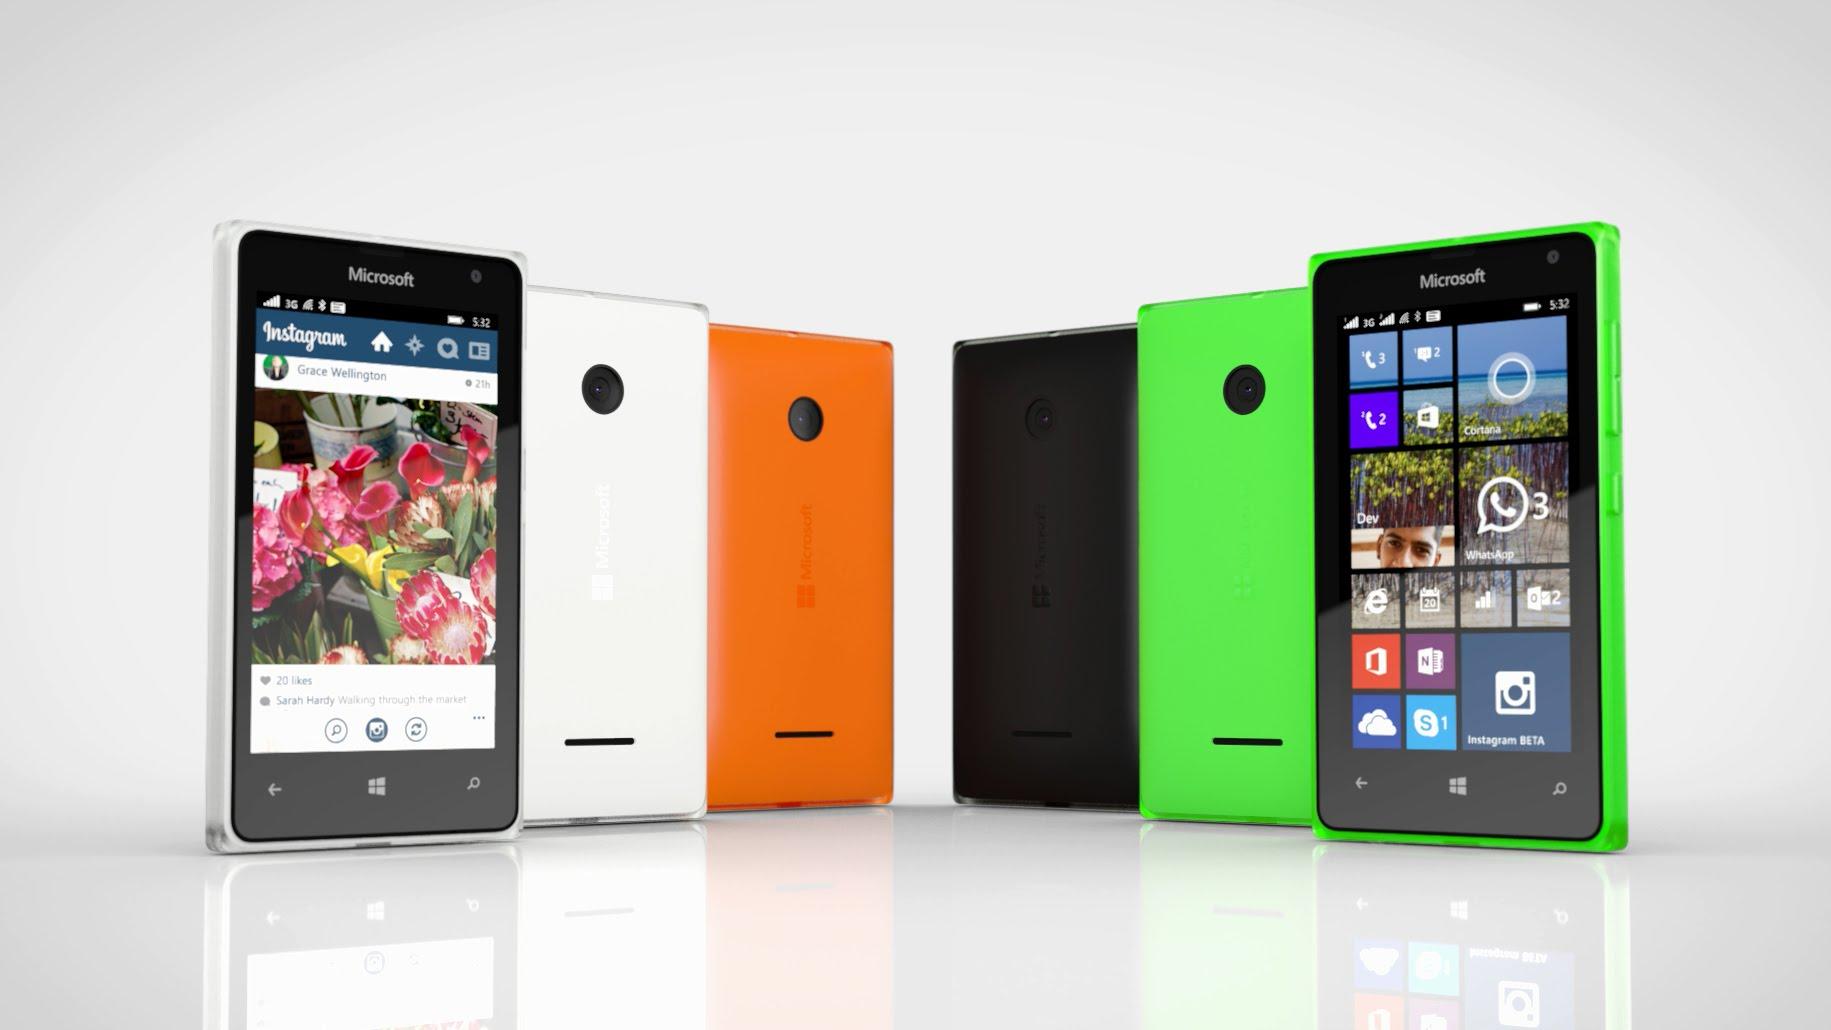 microsoft-lumia-532-dual-sim_8986.jpg